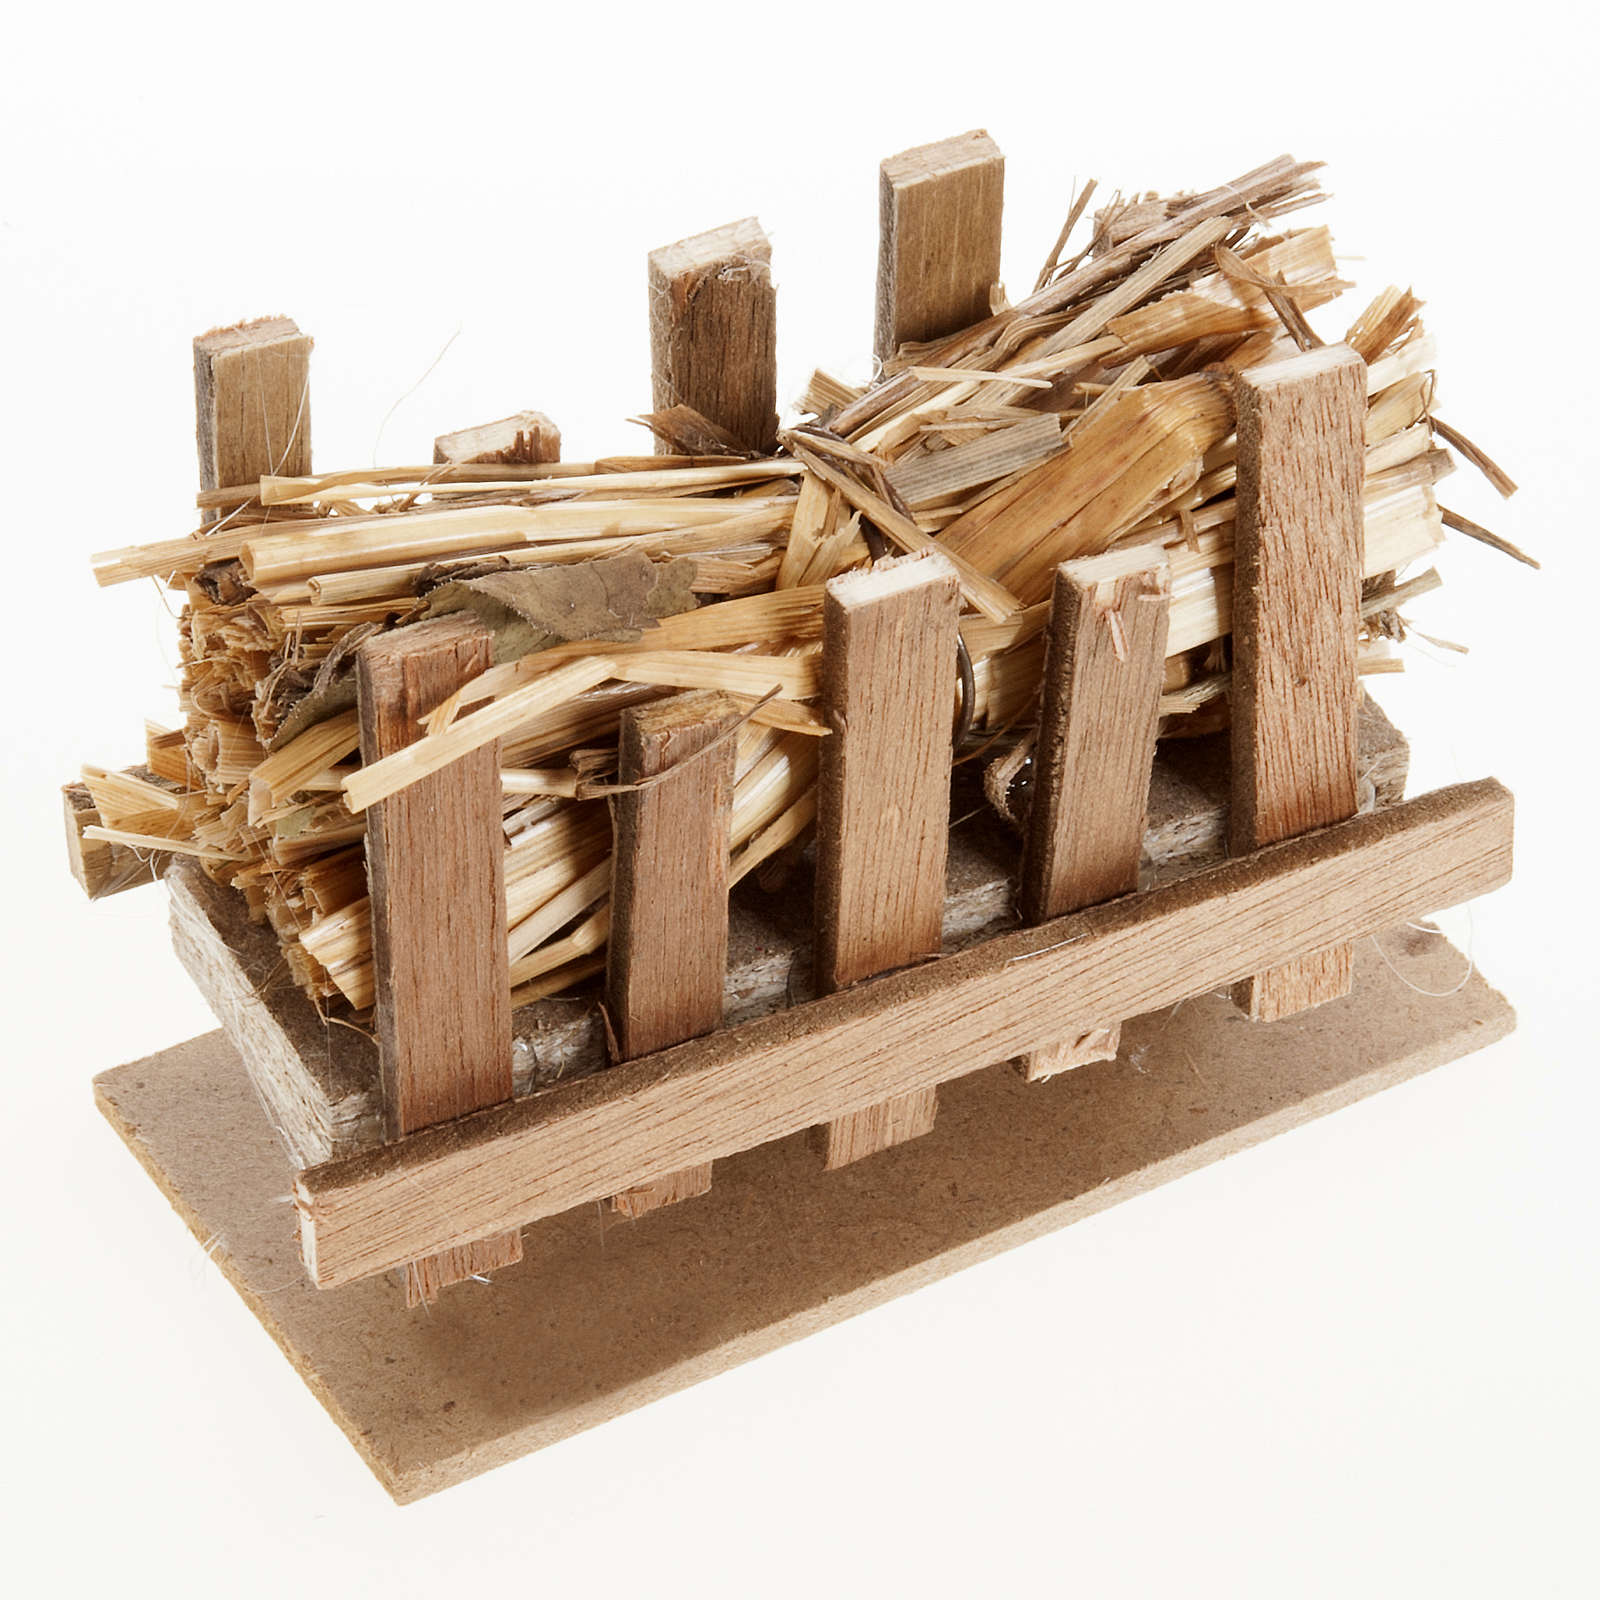 Nativity accessory, manger with straw, 10x5cm 4